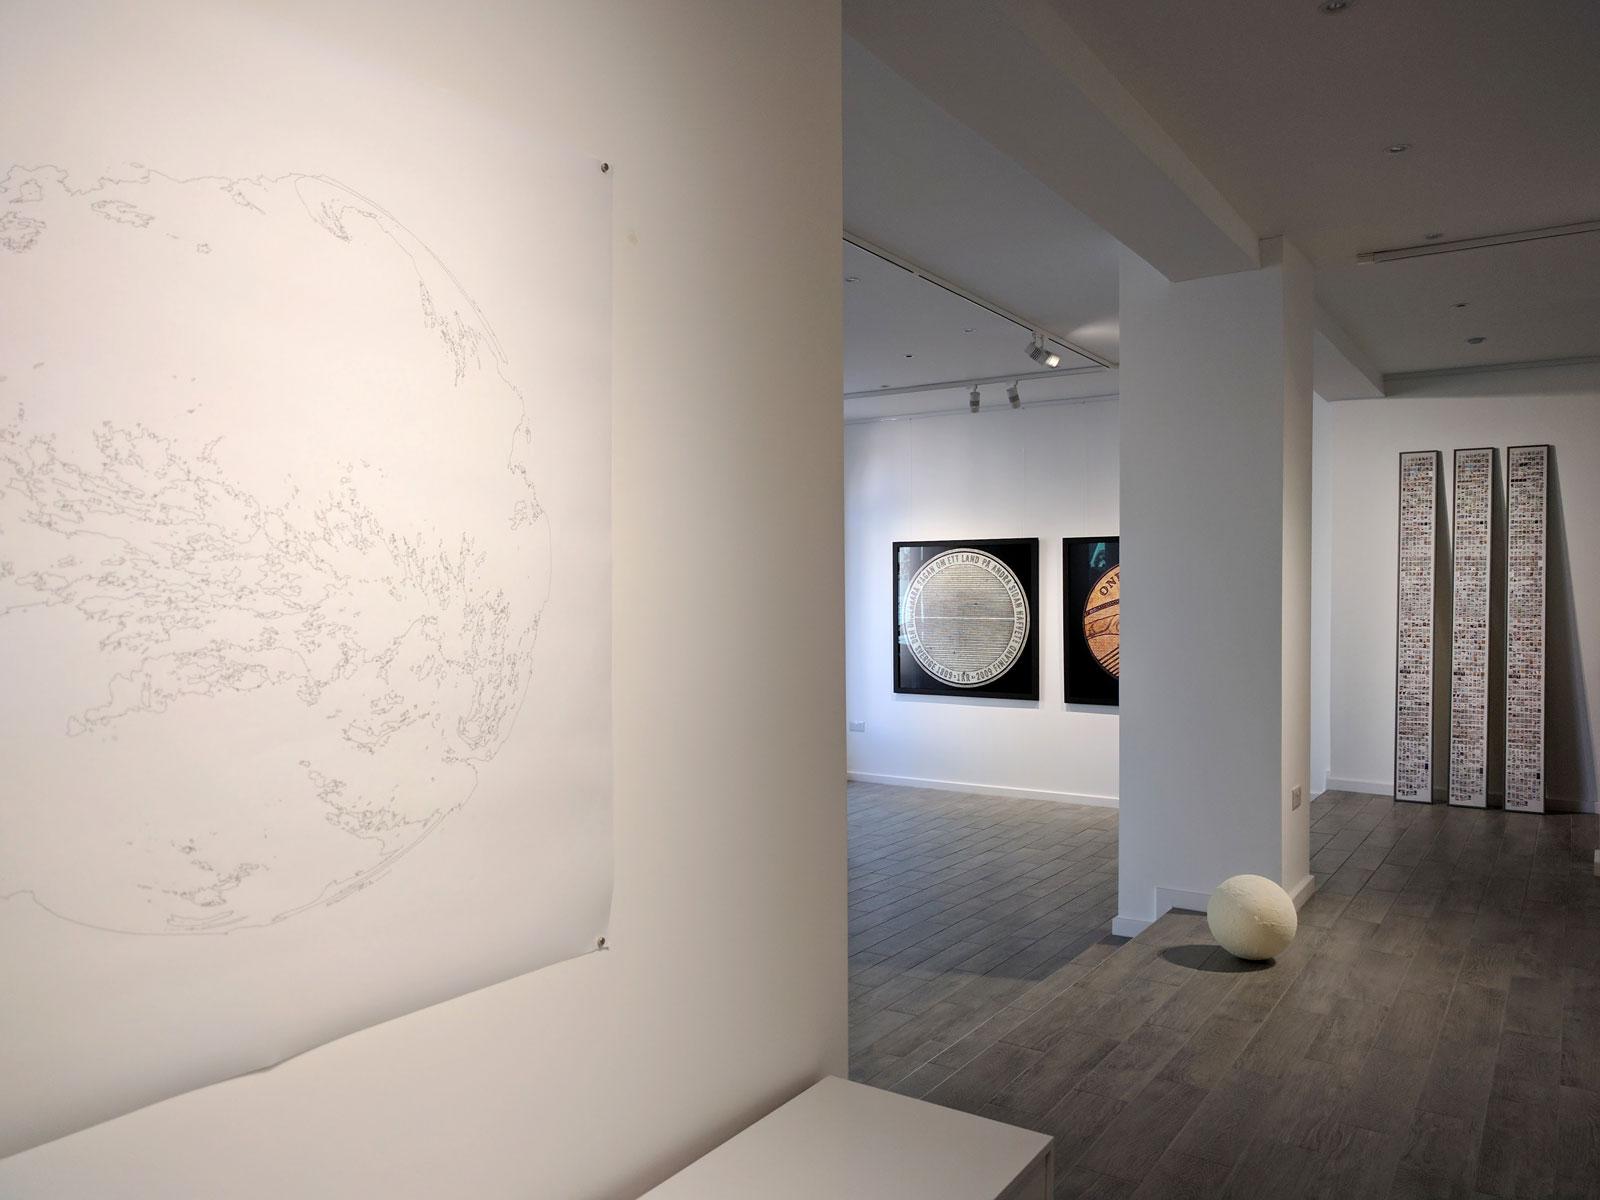 A Planetary Order (Terrestrial Cloud Globe), Argentea Gallery, 2017